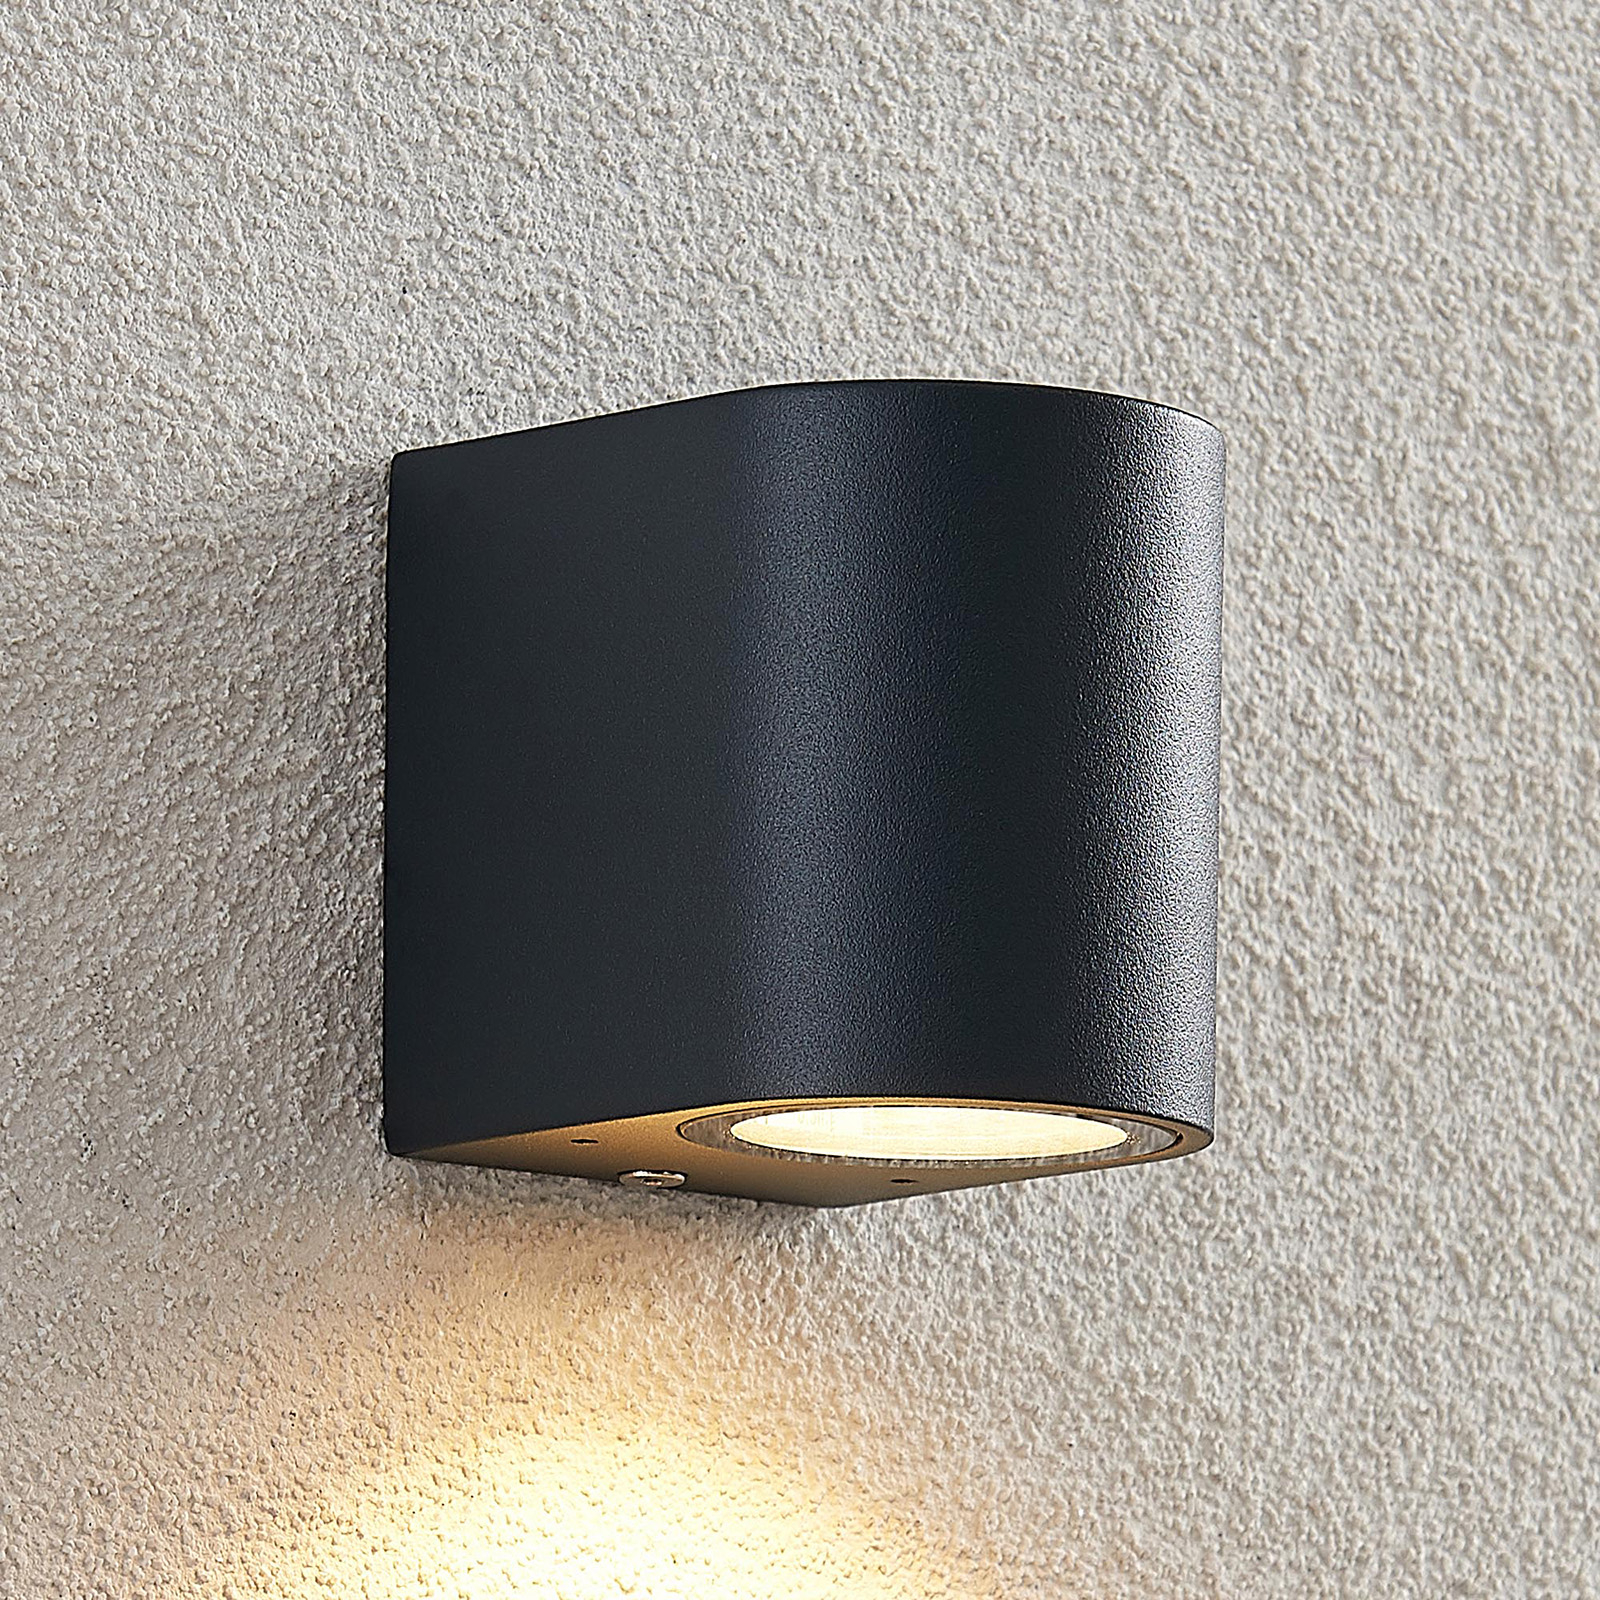 ELC Fijona LED-Außenwandlampe, rund, 8,1 cm